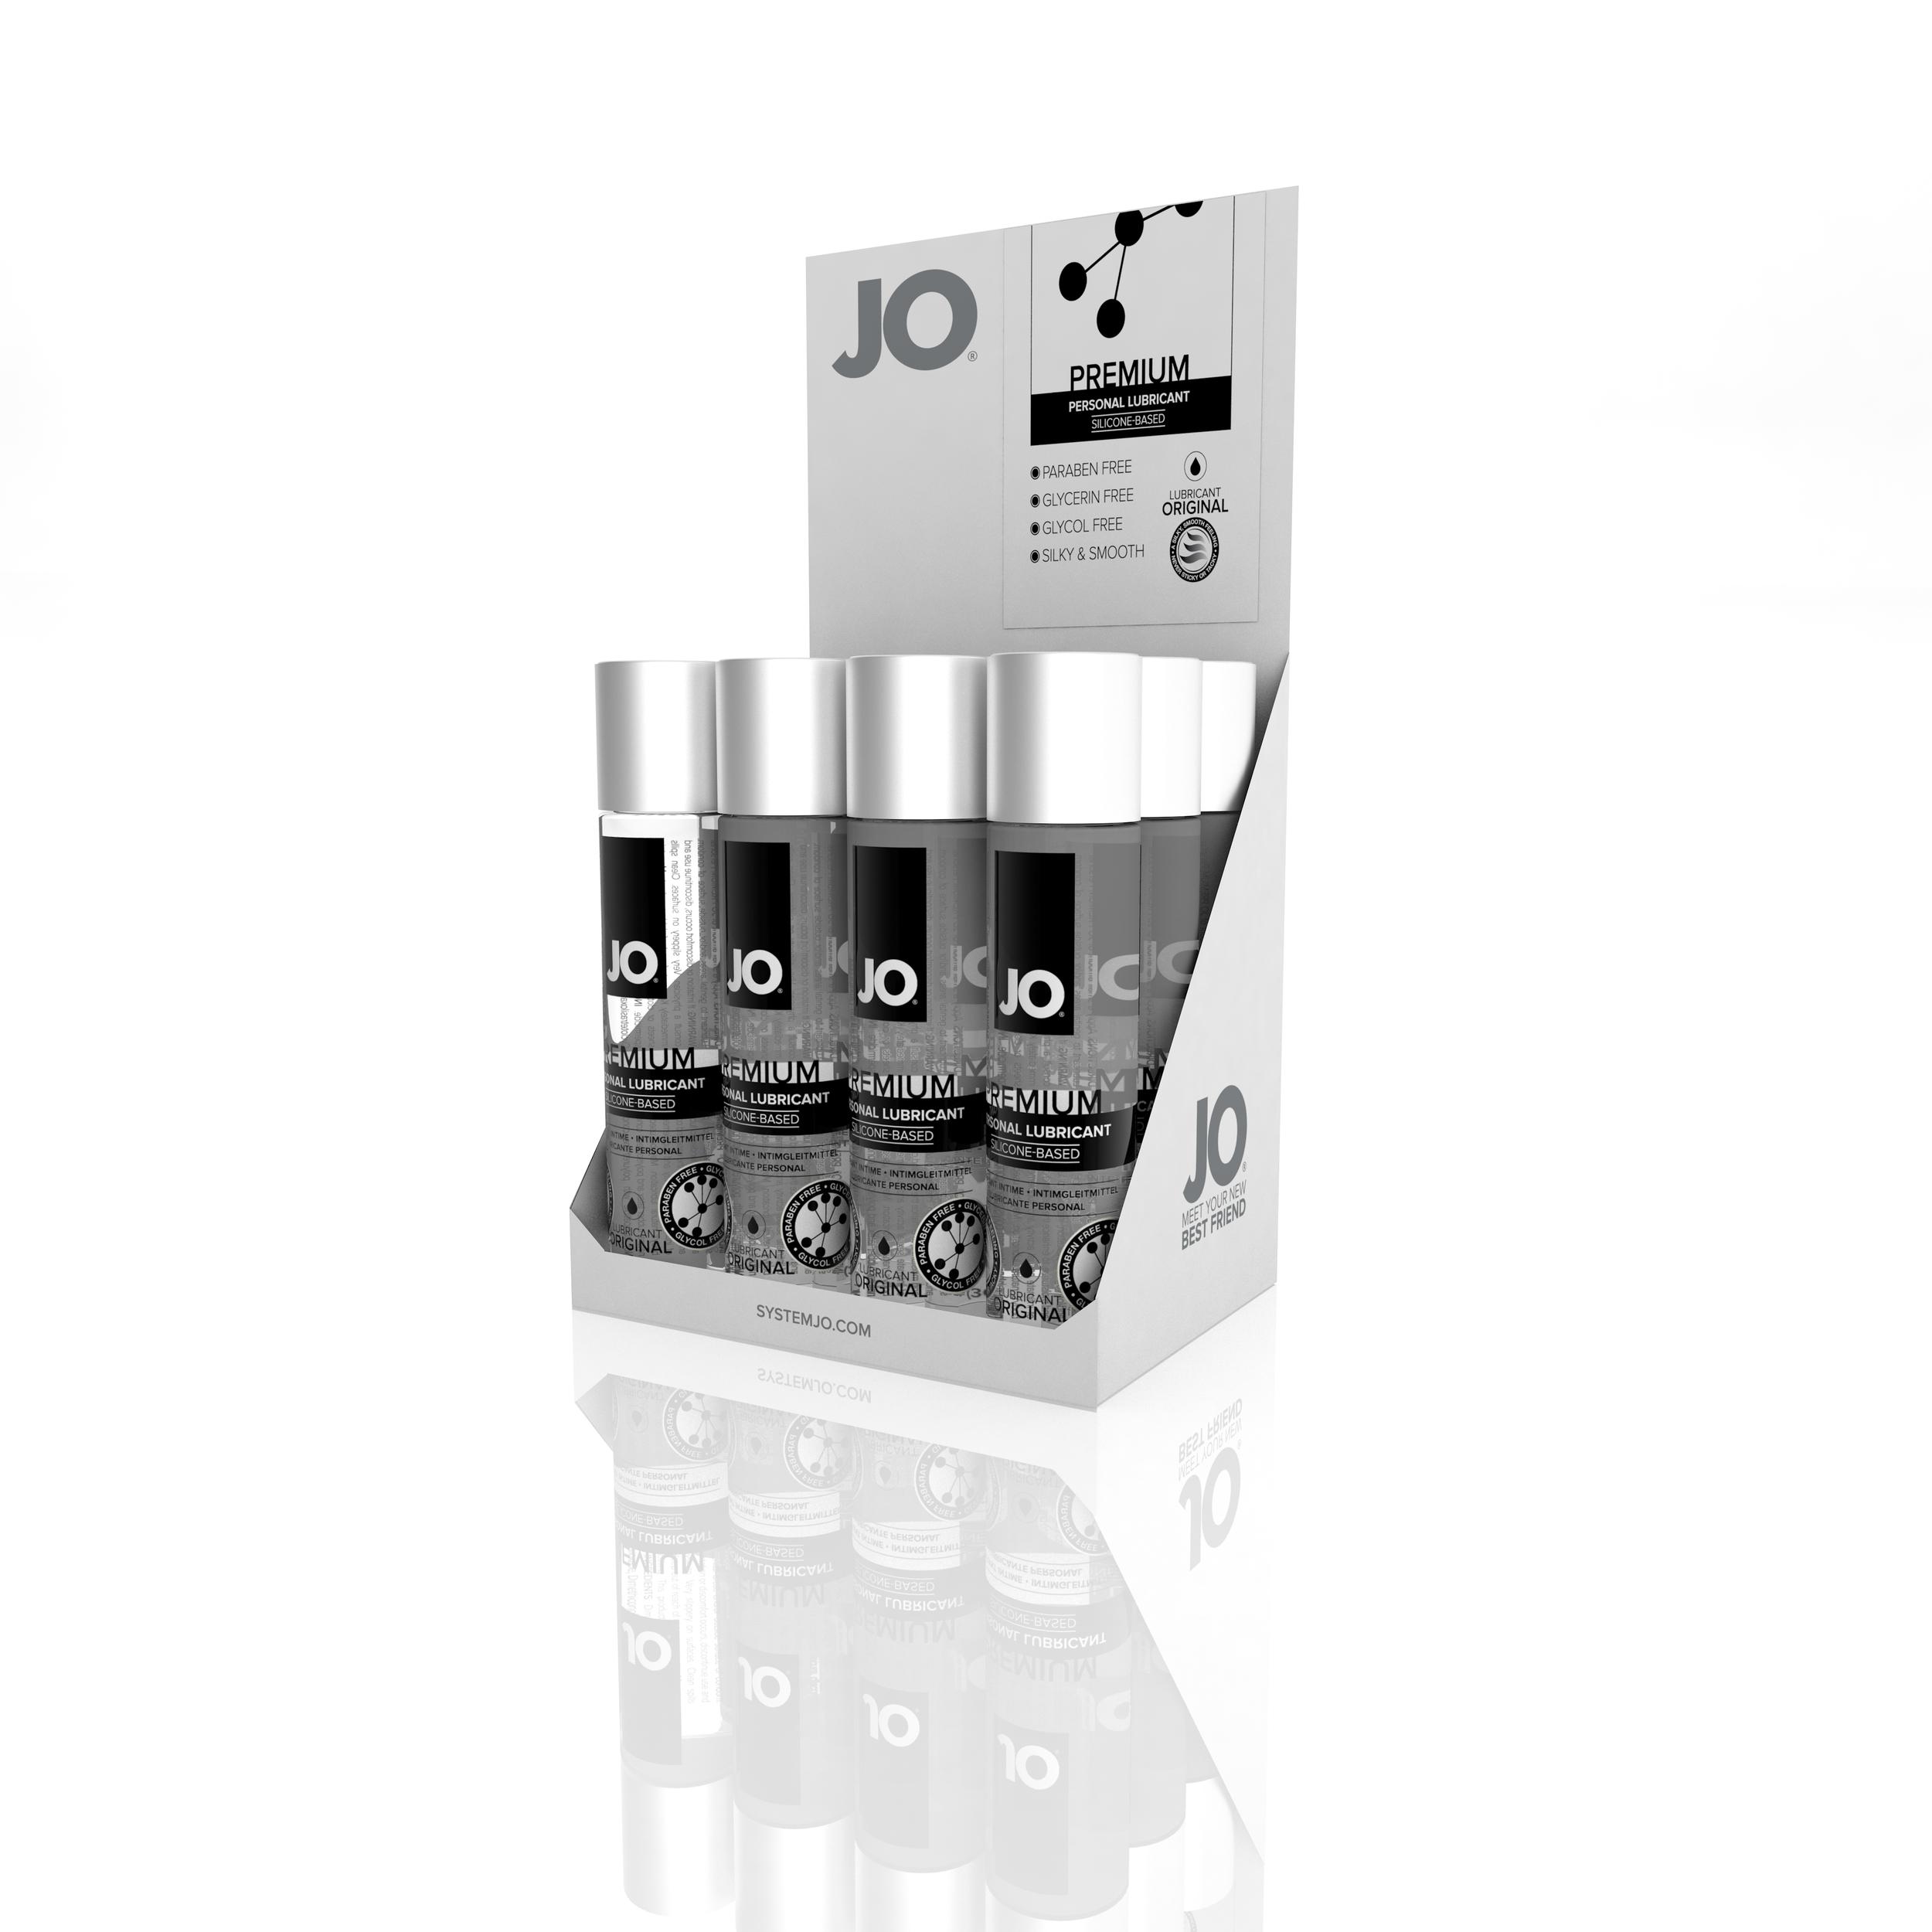 10127 - JO PREMIUM LUBRICANT - ORIGINAL - 1fl.oz 30mL (MOQ 12 units - Includes Counter Display).jpg